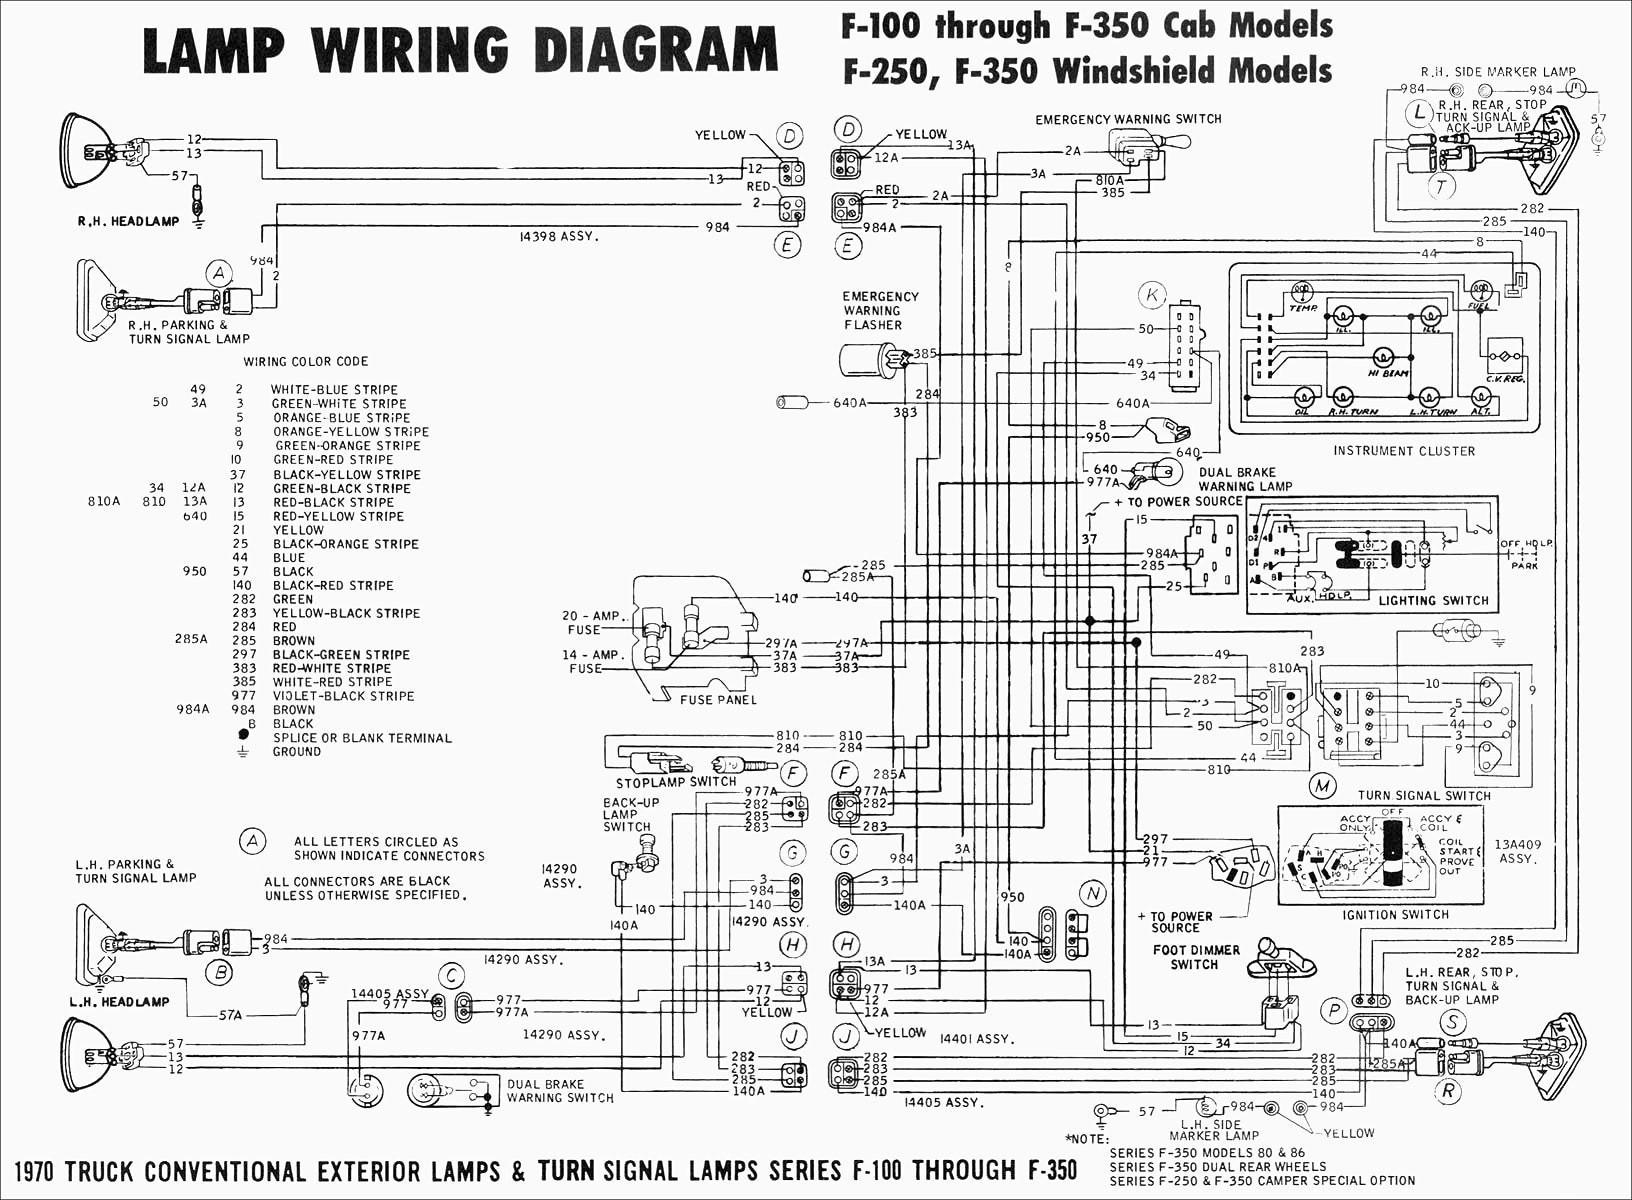 Amp Wiring Diagram Car 1f0f9 C6 Wiring Diagrams Of Amp Wiring Diagram Car